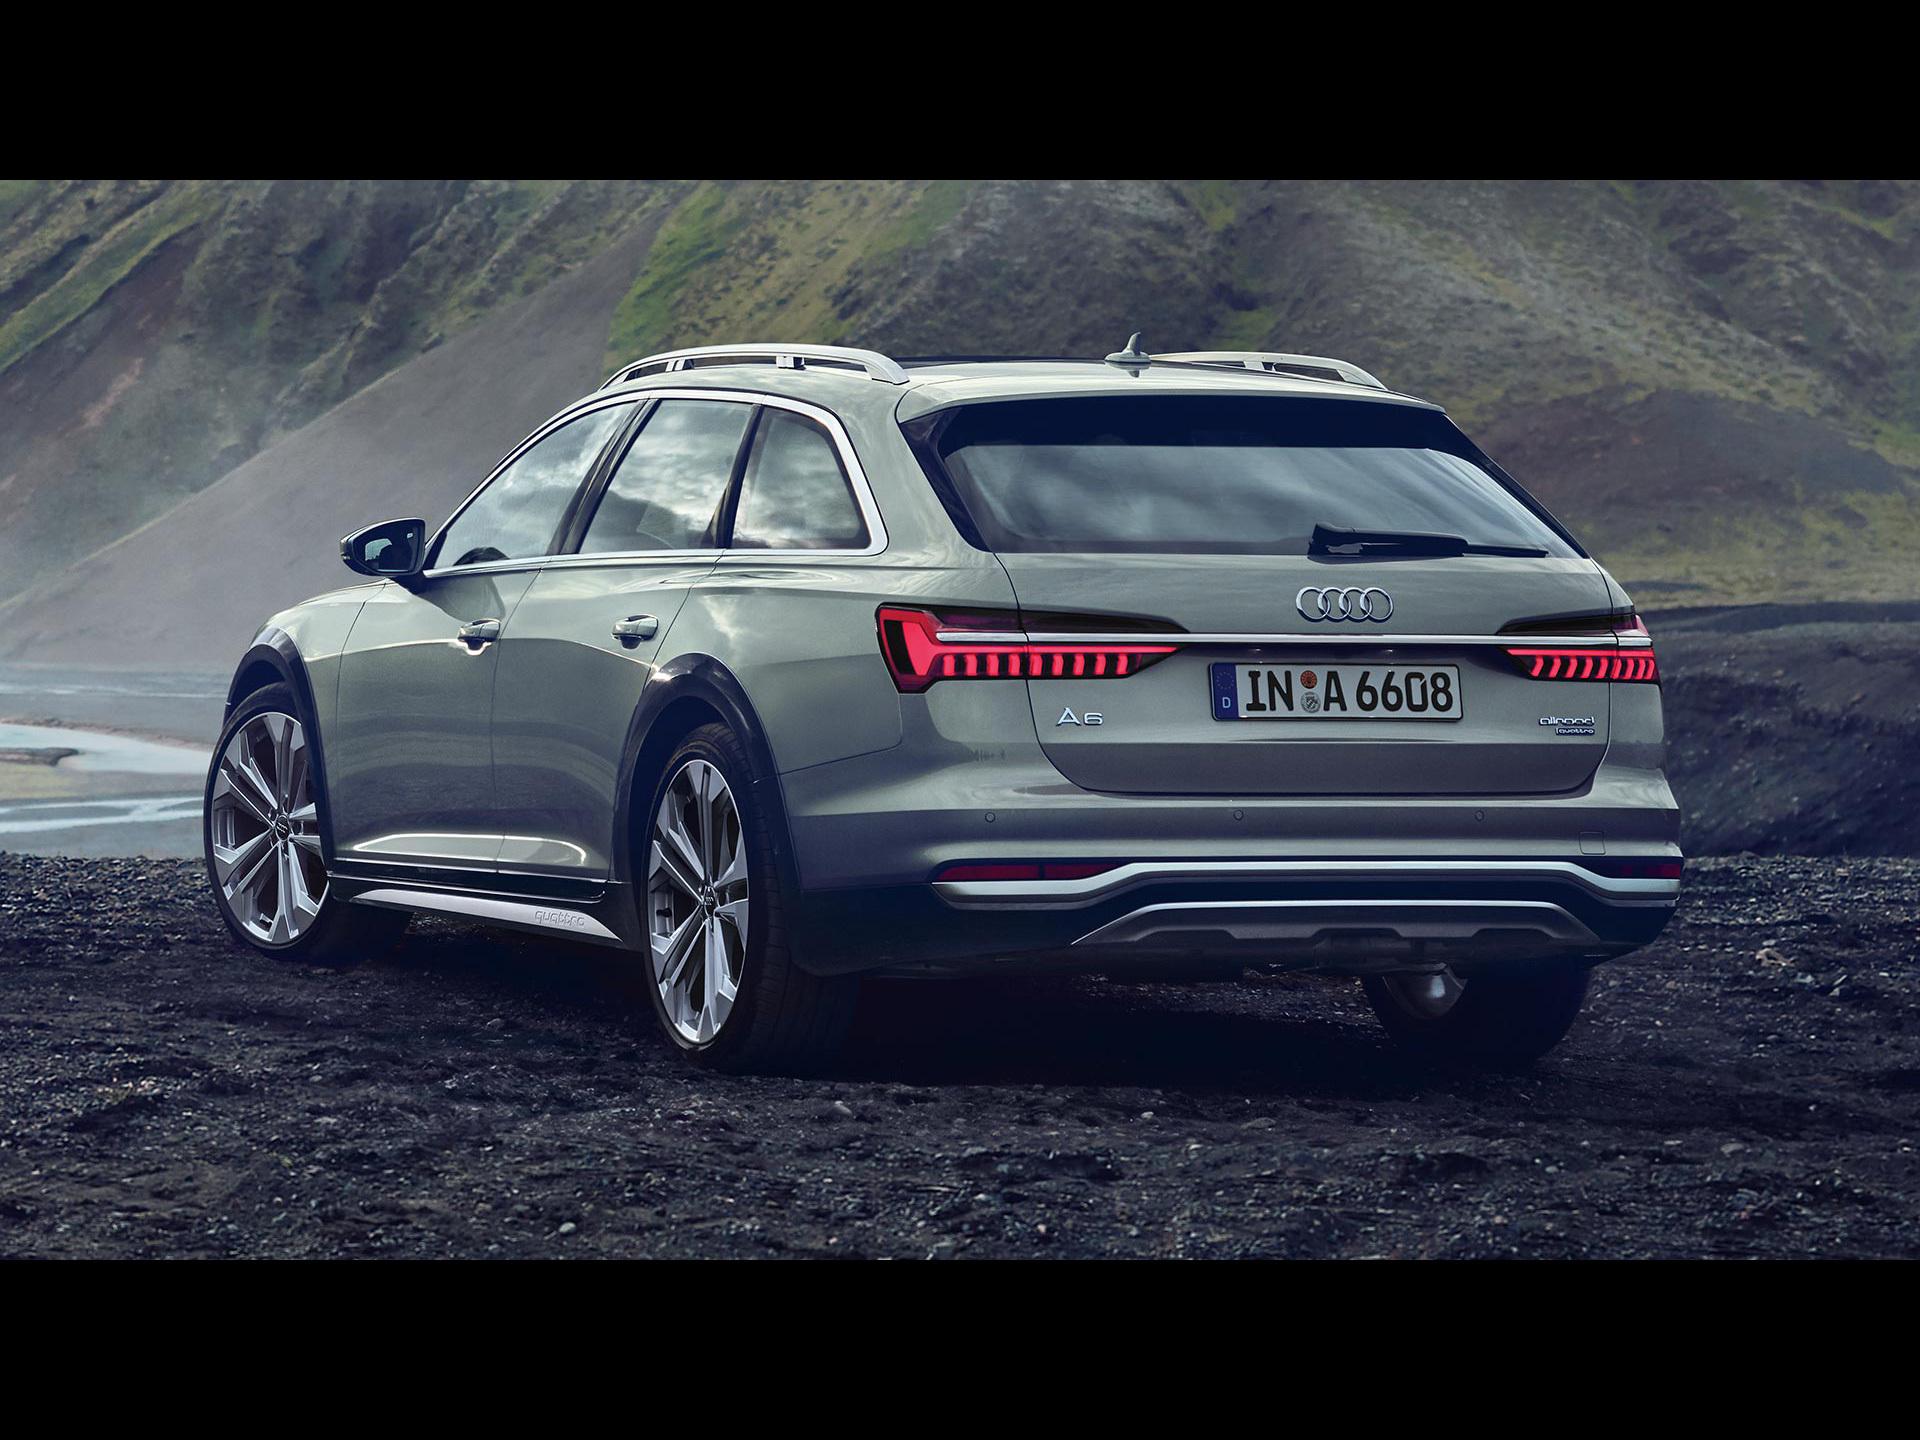 Audi A6 allroad quattro 2020 - アウディに嵌まる - 壁紙画像ブログ